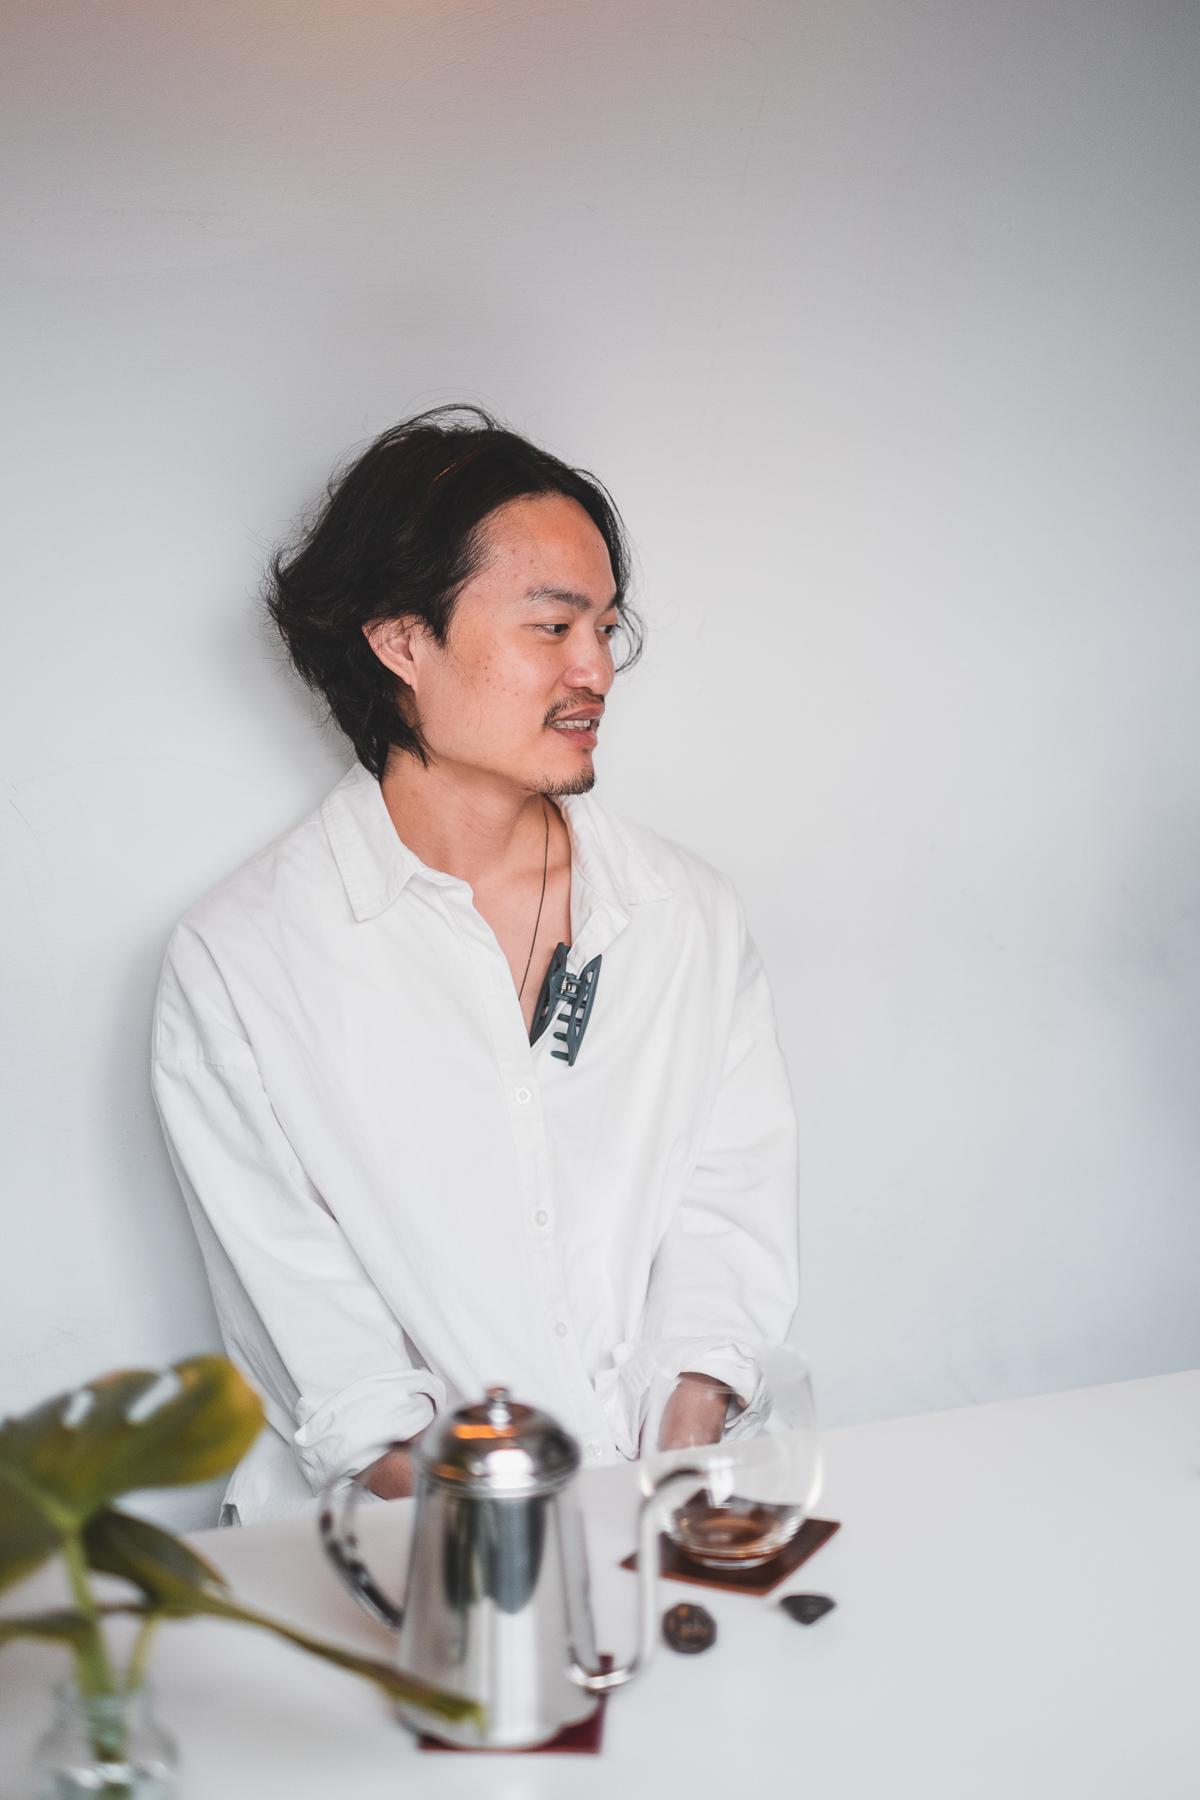 Taipei Taiwan W&M Workshop Coffee Shop Interview - FUJIFilmXT33514 - Yes! Please Enjoy by Fanning Tseng-8.jpg